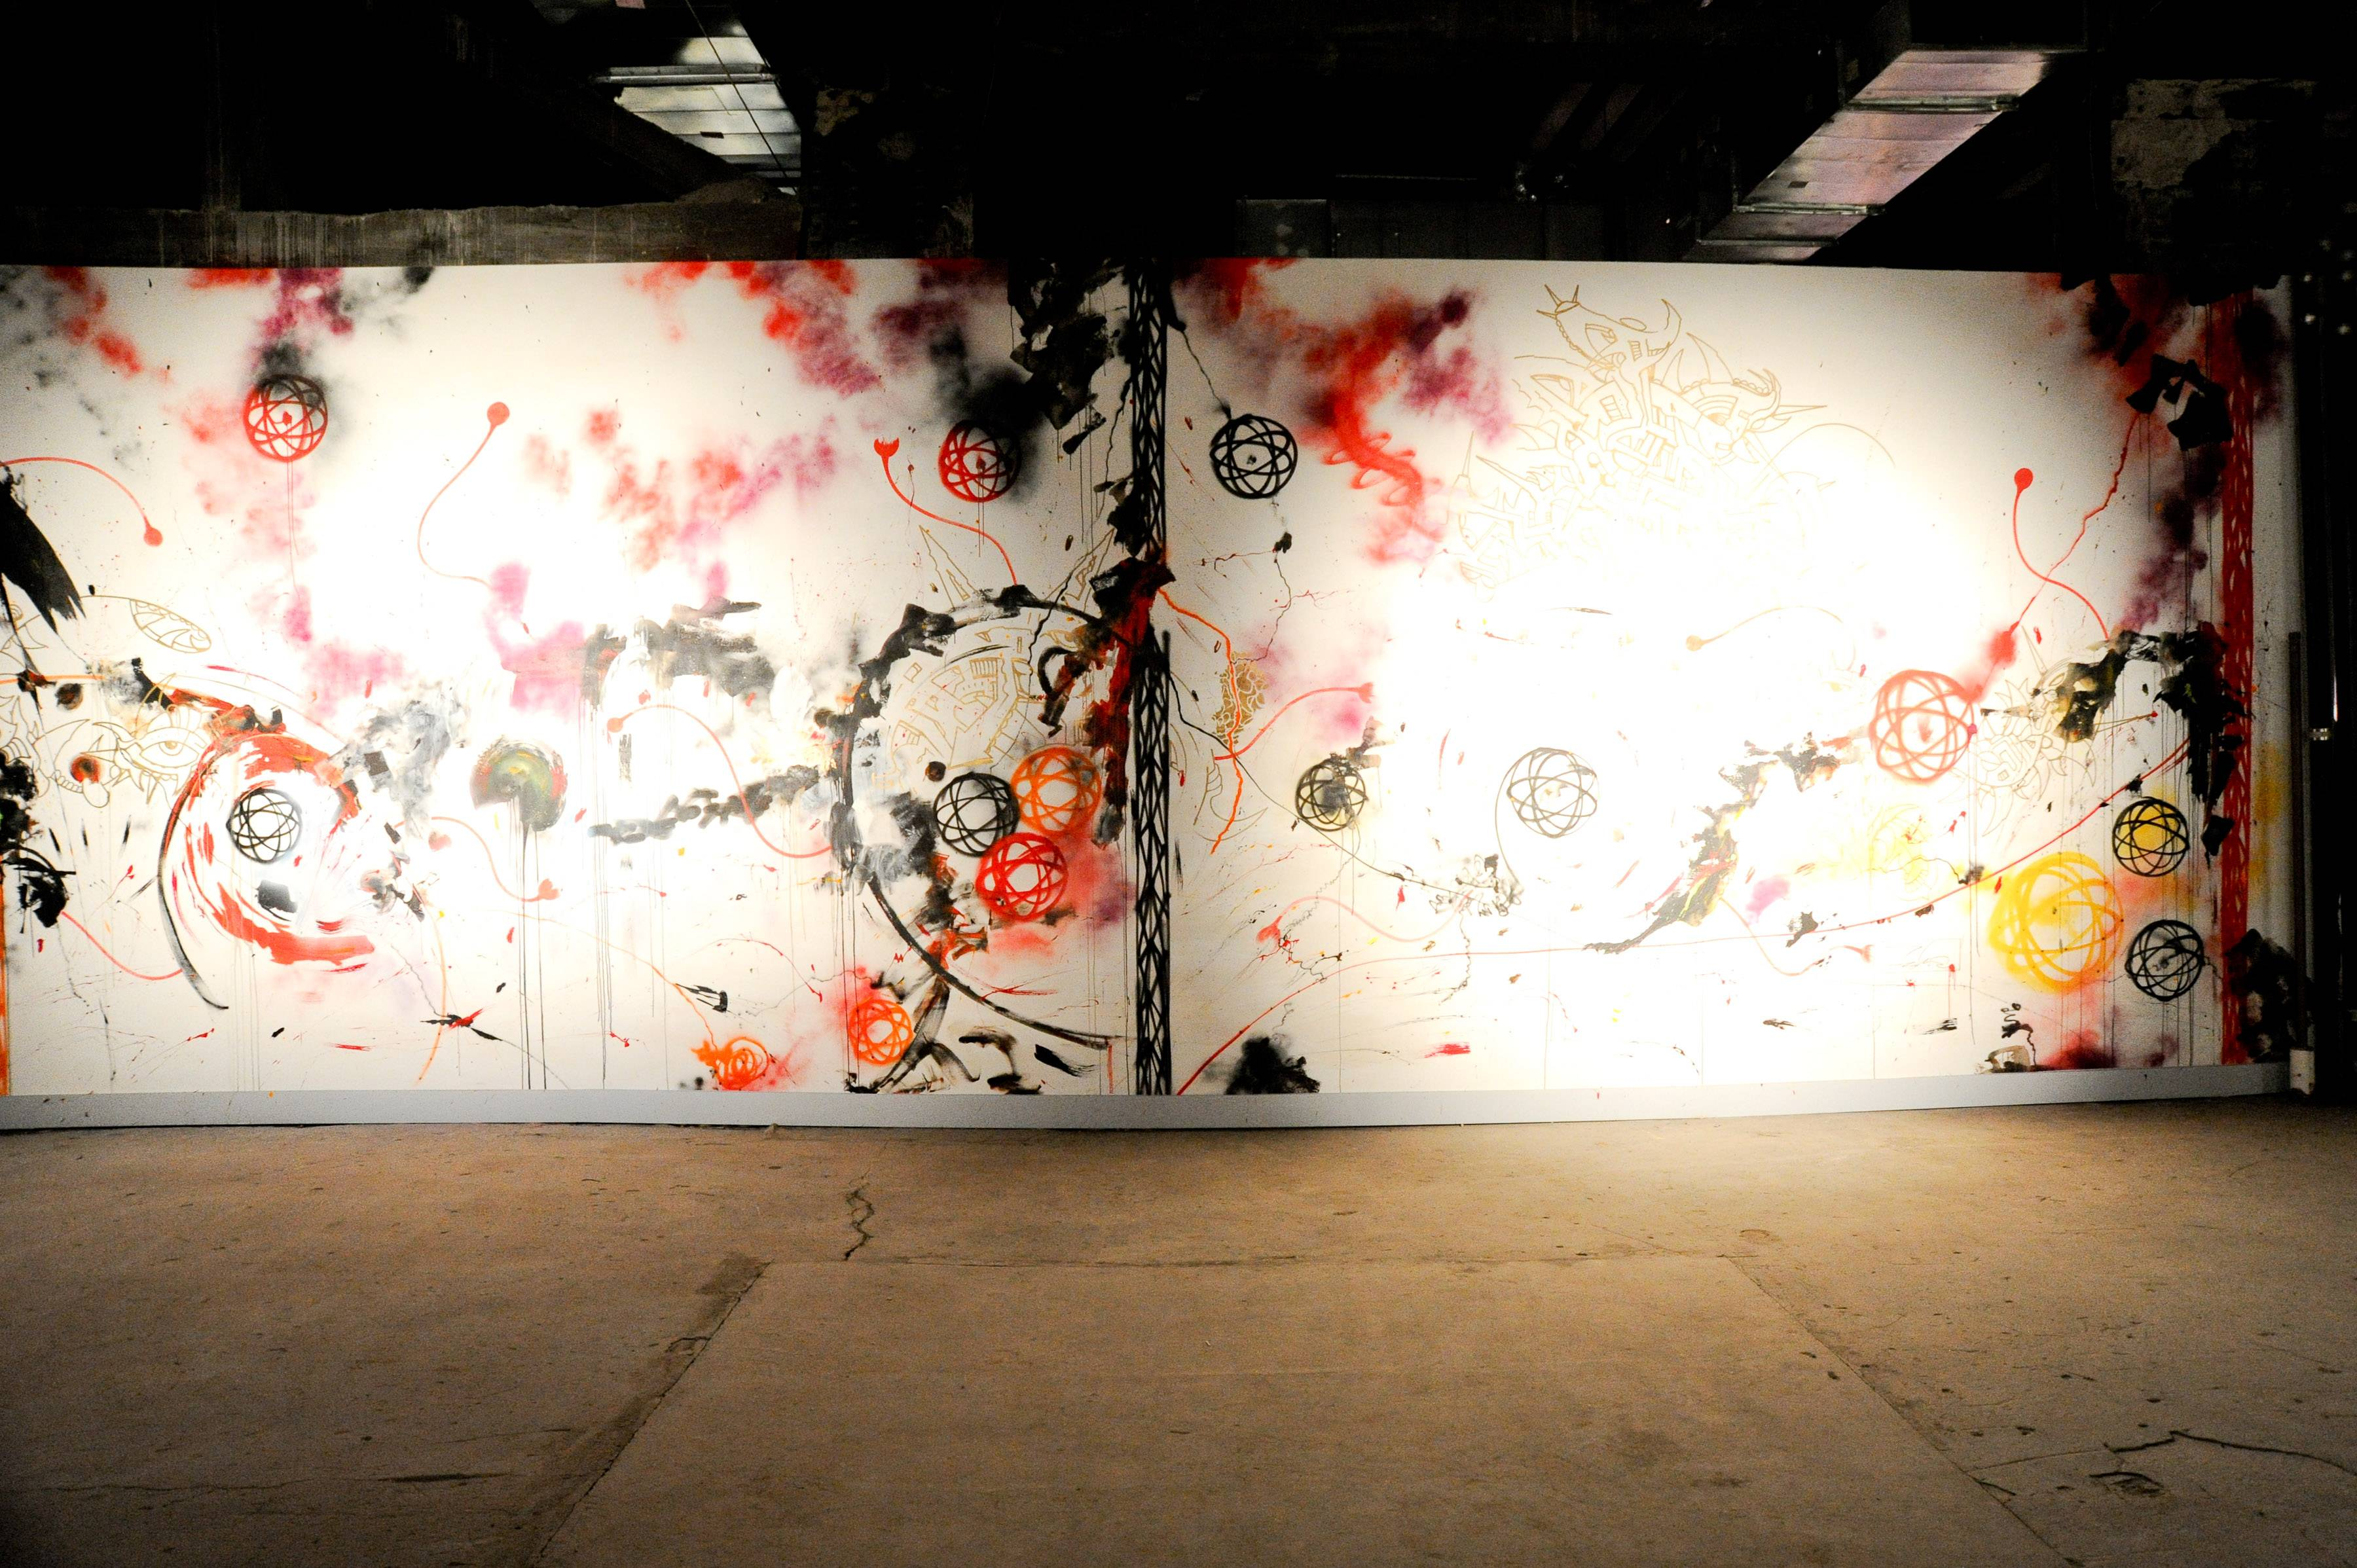 Joseph Nahmad Contemporary Opening For Deep Space Featuring Matta, Phase 2, Futura and Rammellzee